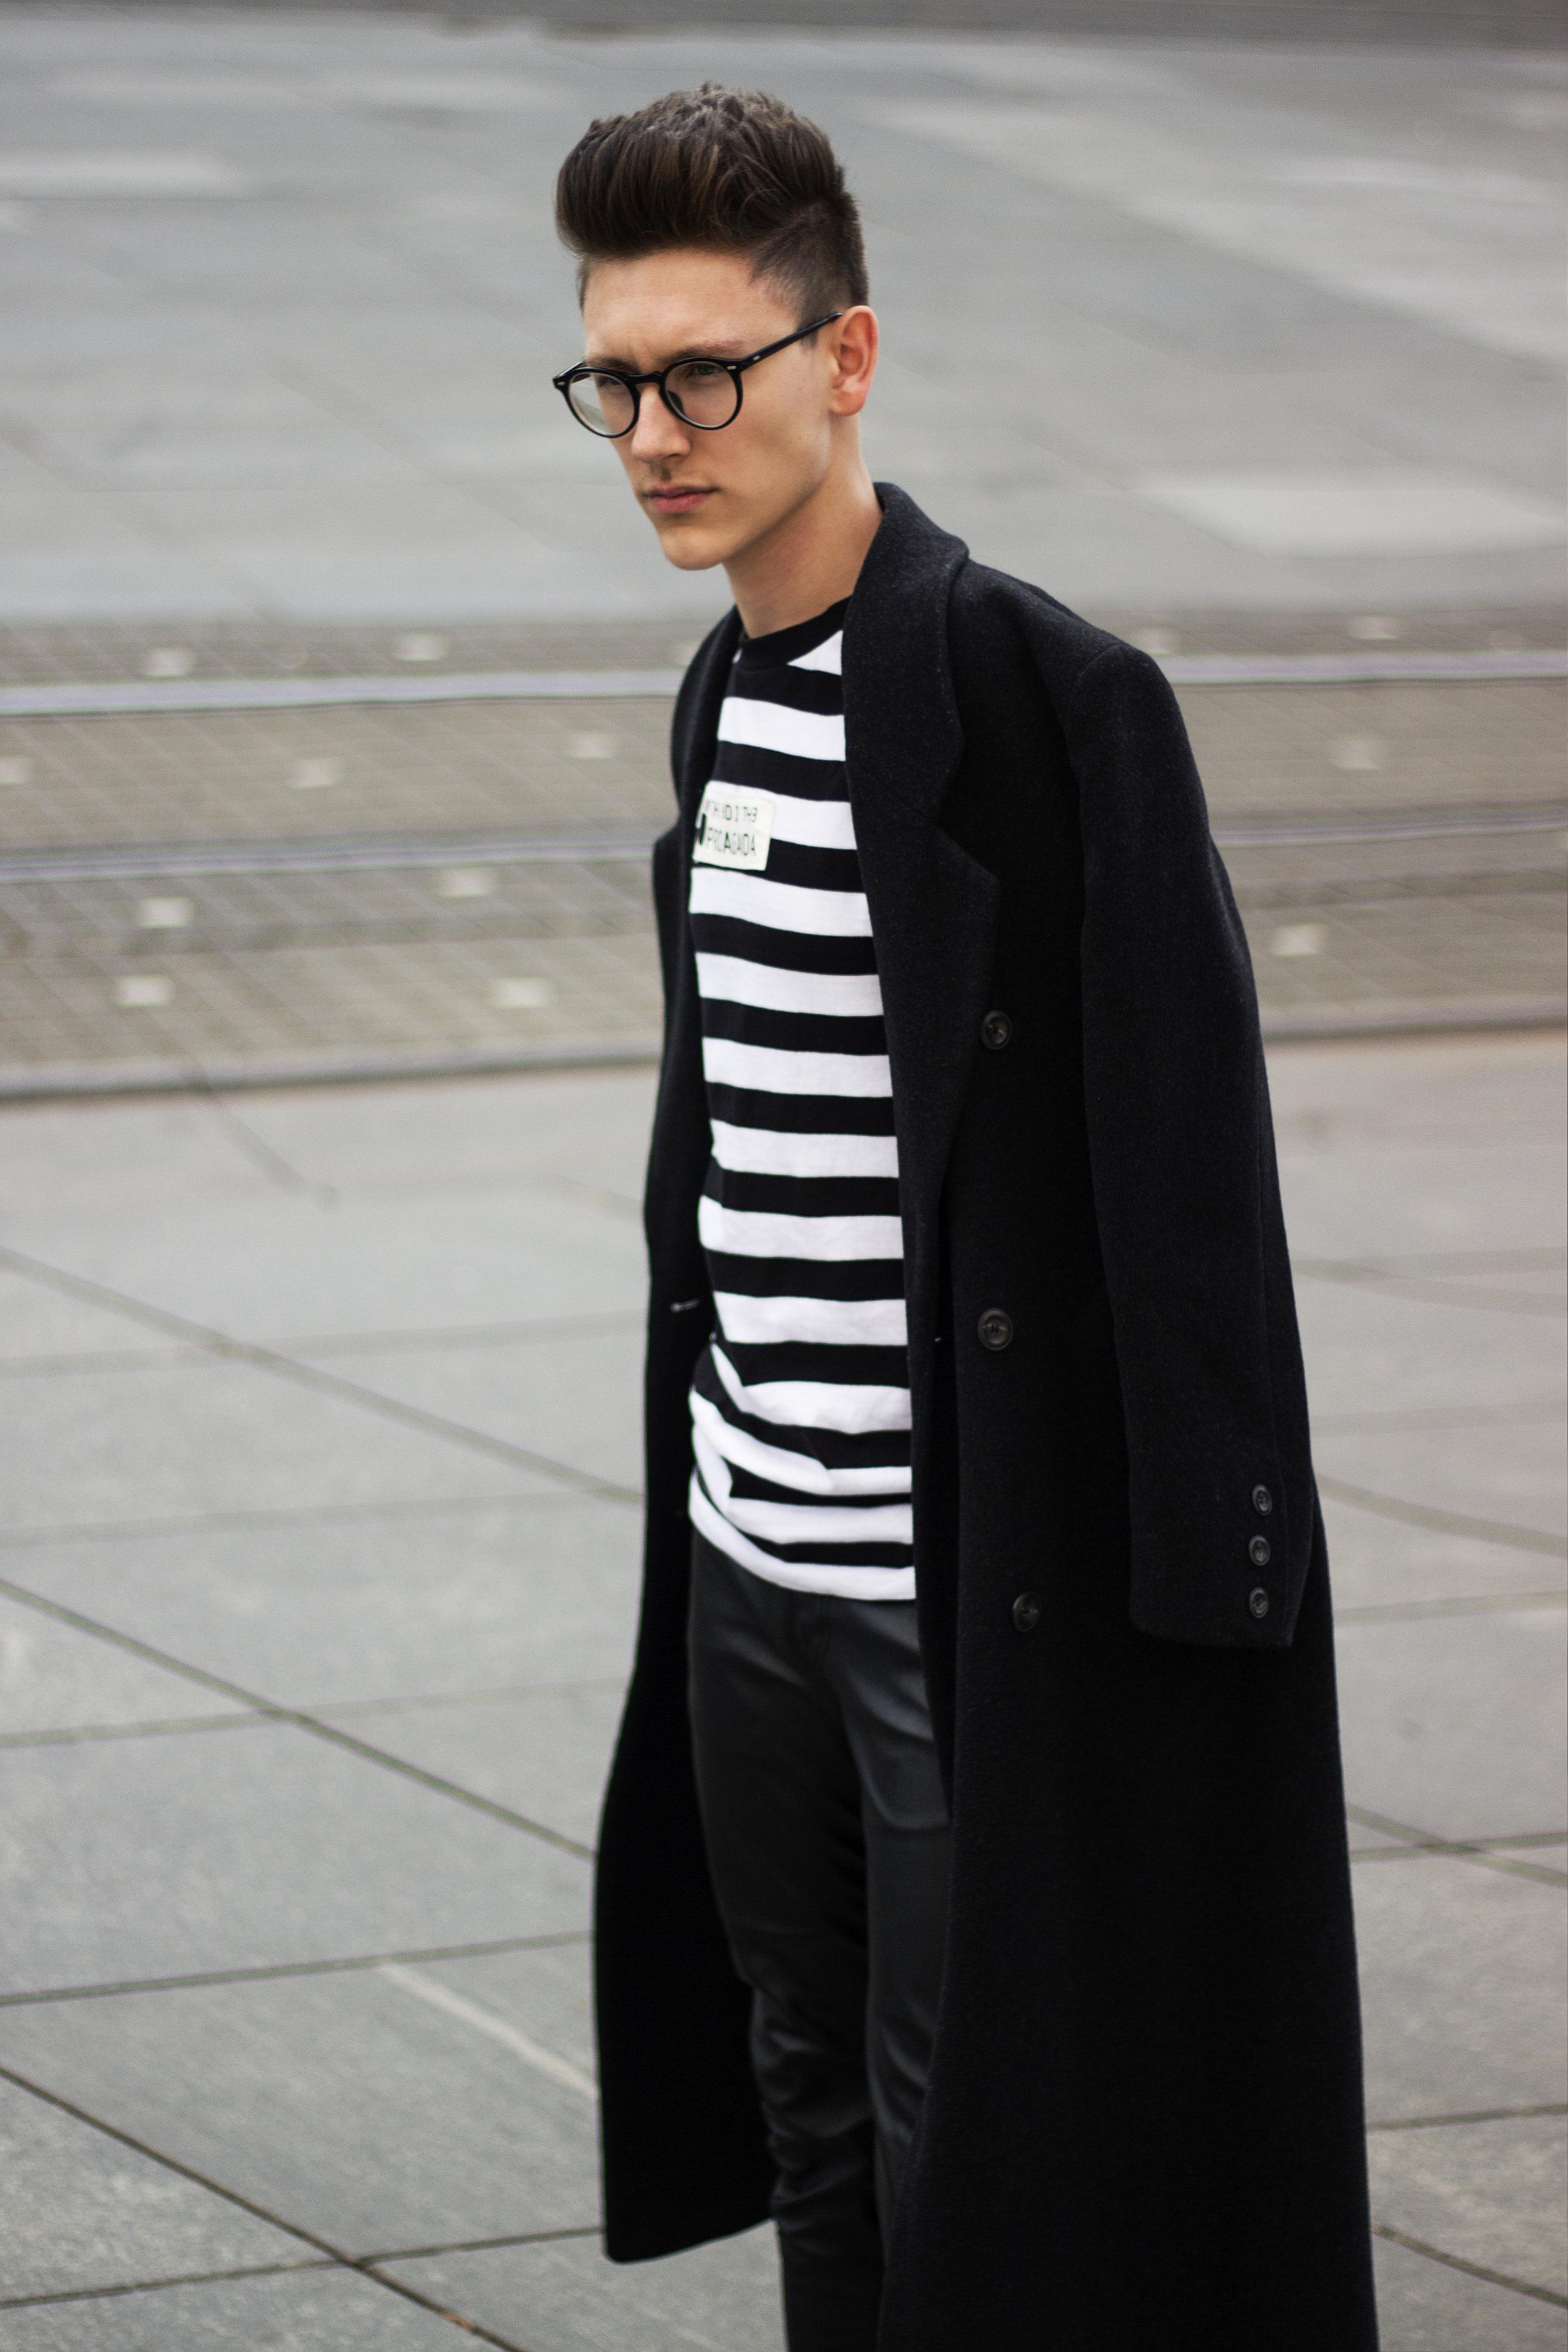 luka-lajic-expensive-reality-hm-mens-fashion-croatia-blogger (2).jpg